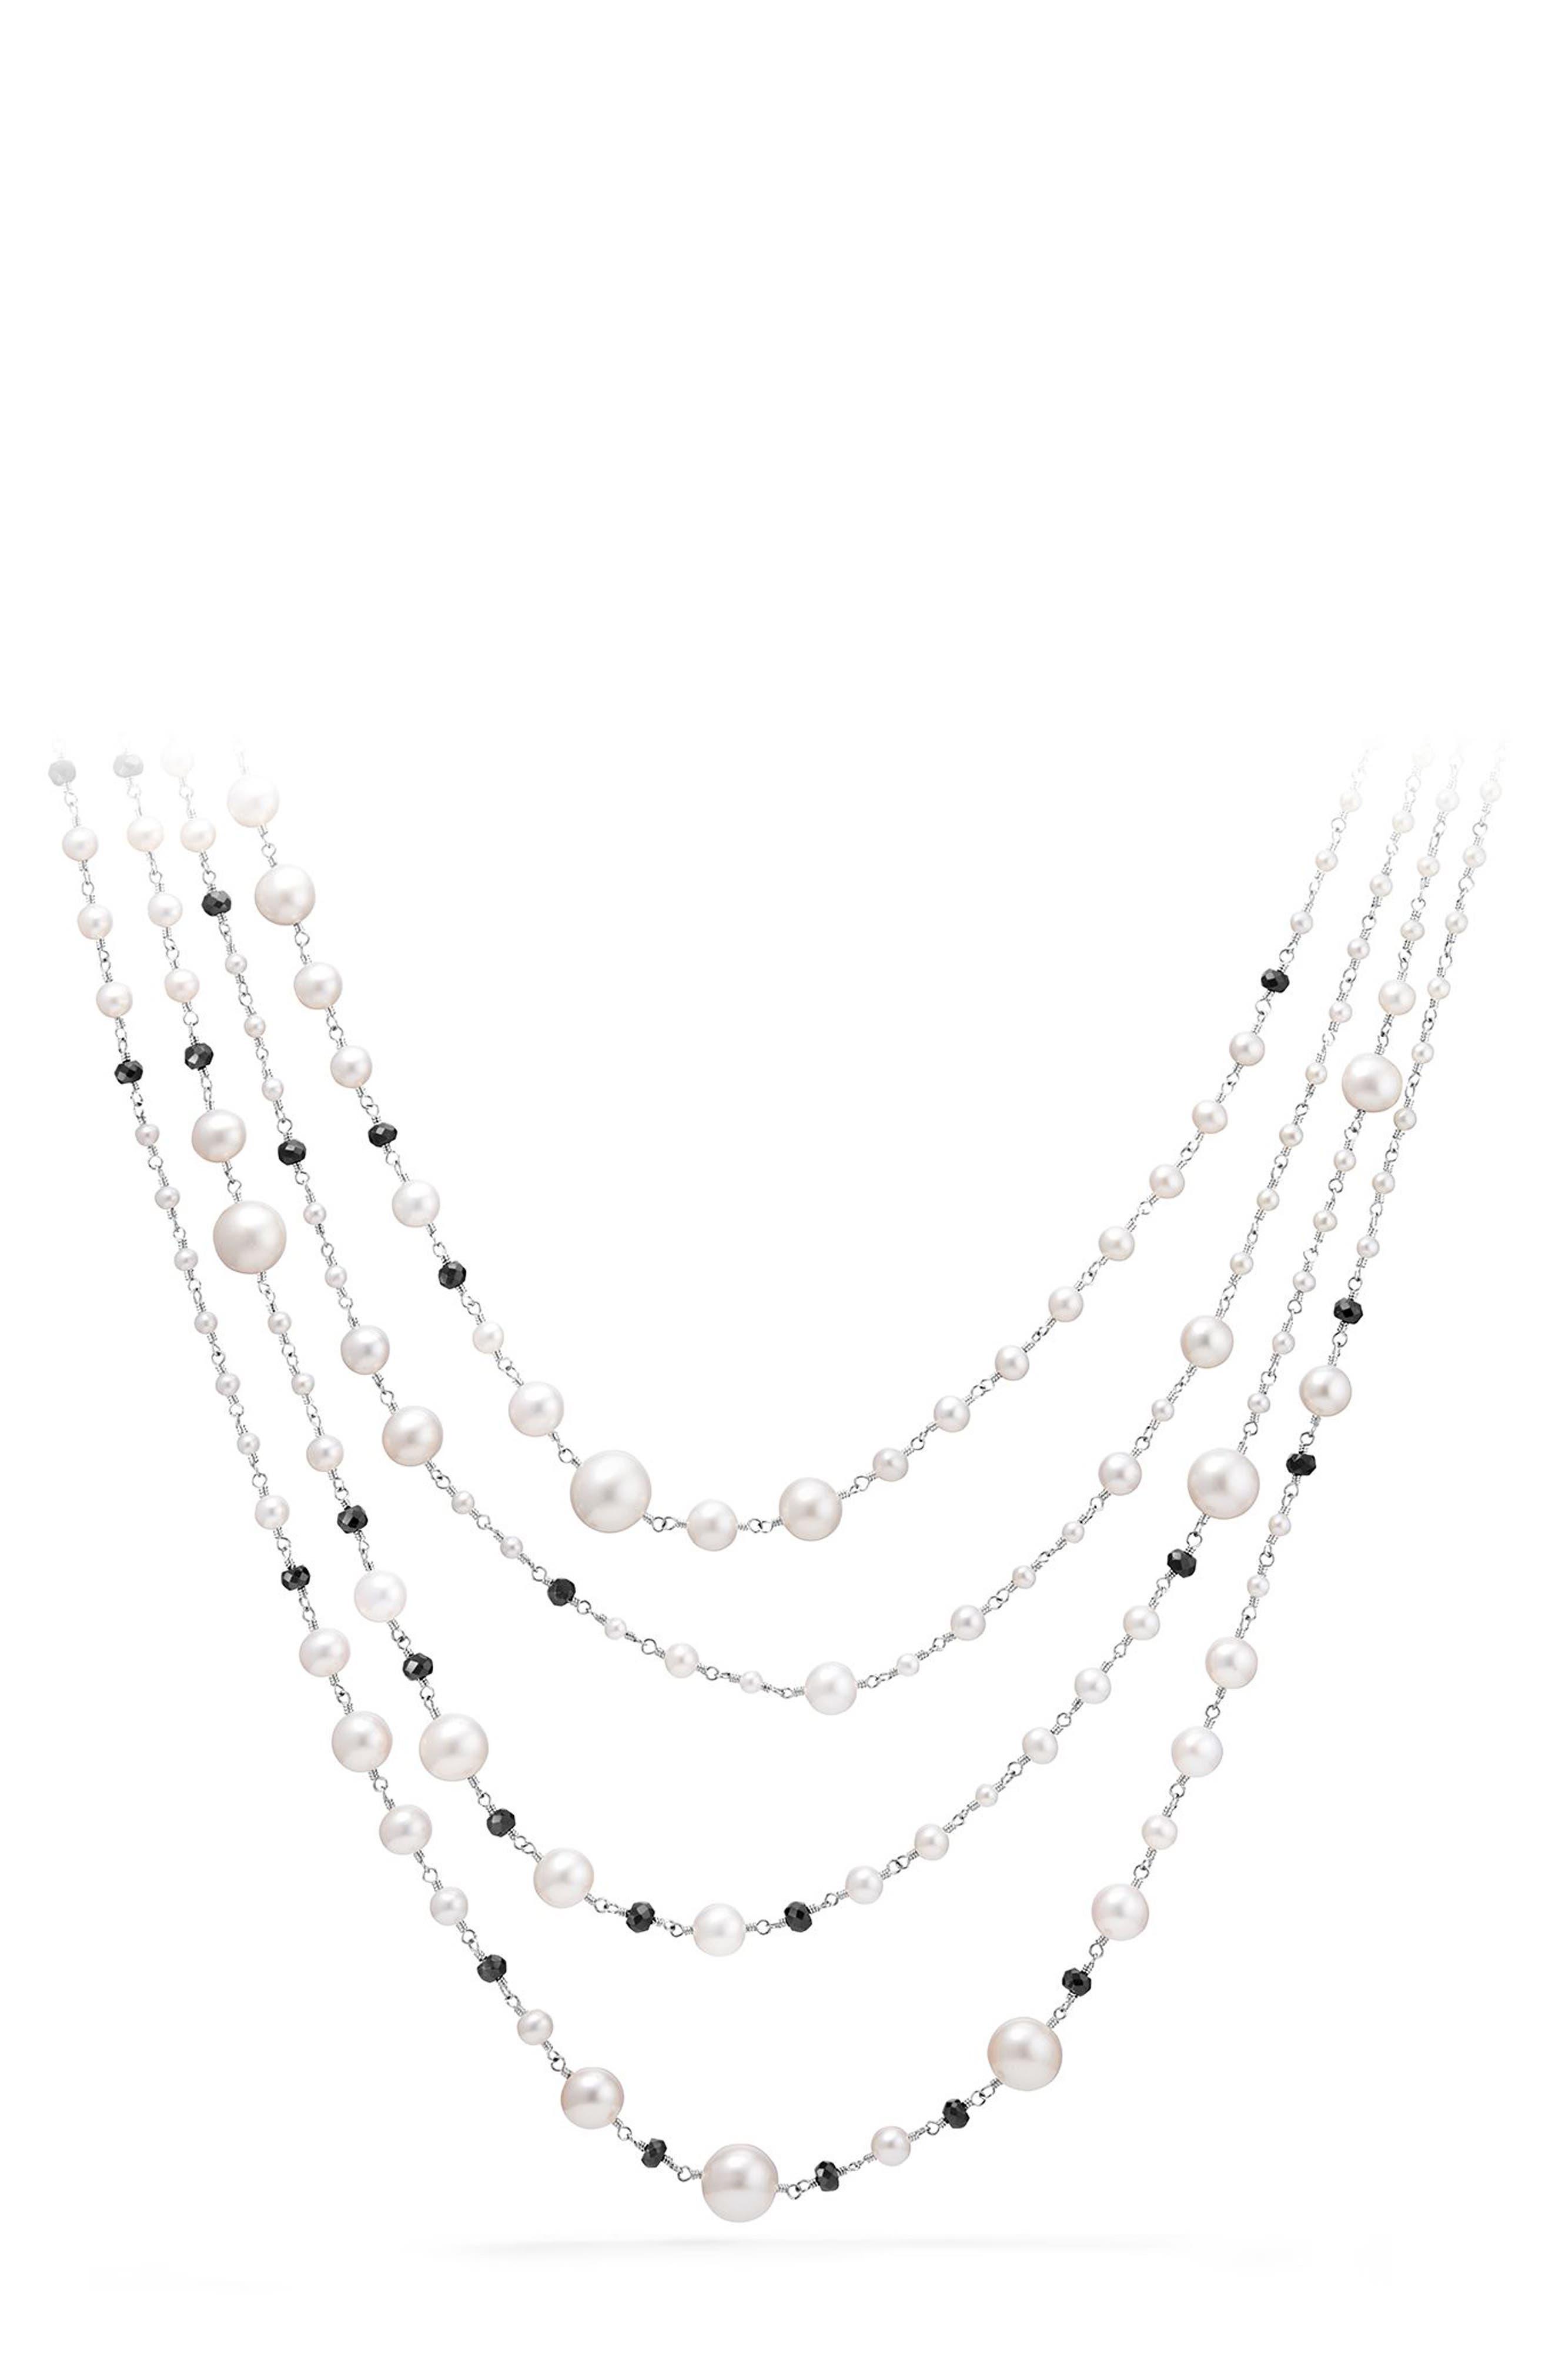 Main Image - David Yurman Solari Pearl & Bead Multistrand Necklace